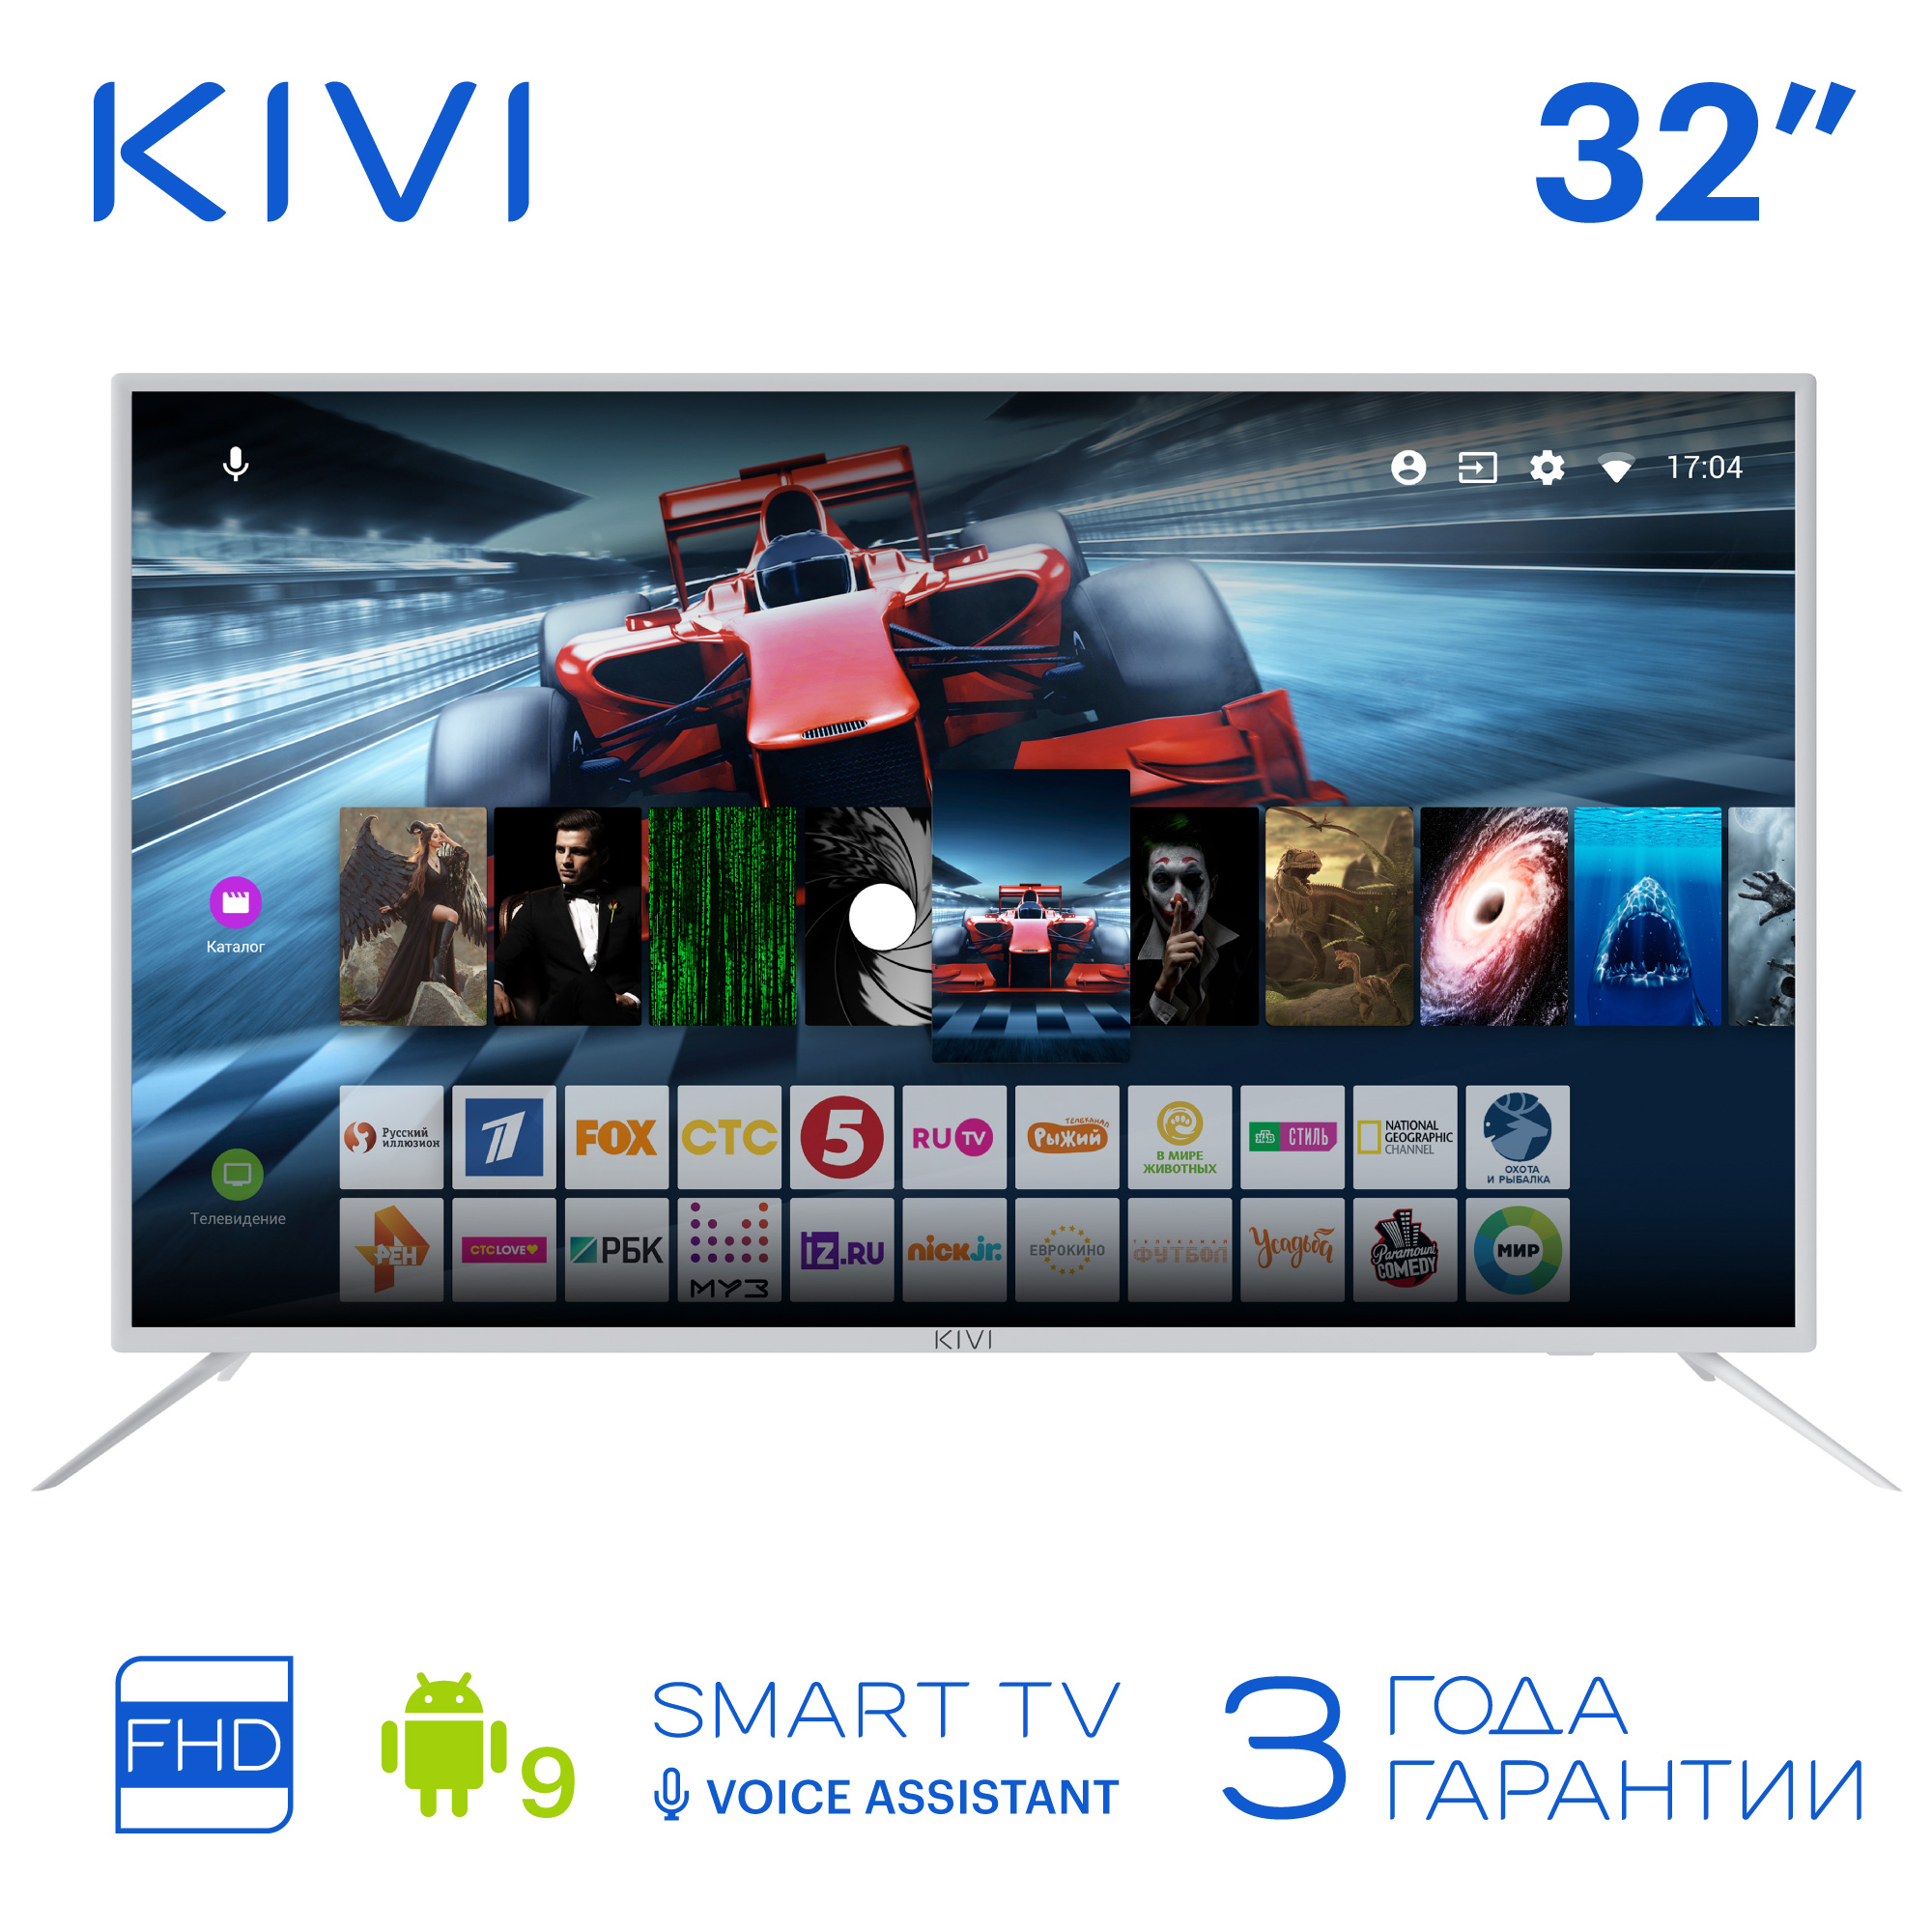 "32 ""KIVI 32F700WR Full HD Smart TV Android 9 HDR гоееееееееееееееееннннннненнненненнненнененененененененененоененененнено"